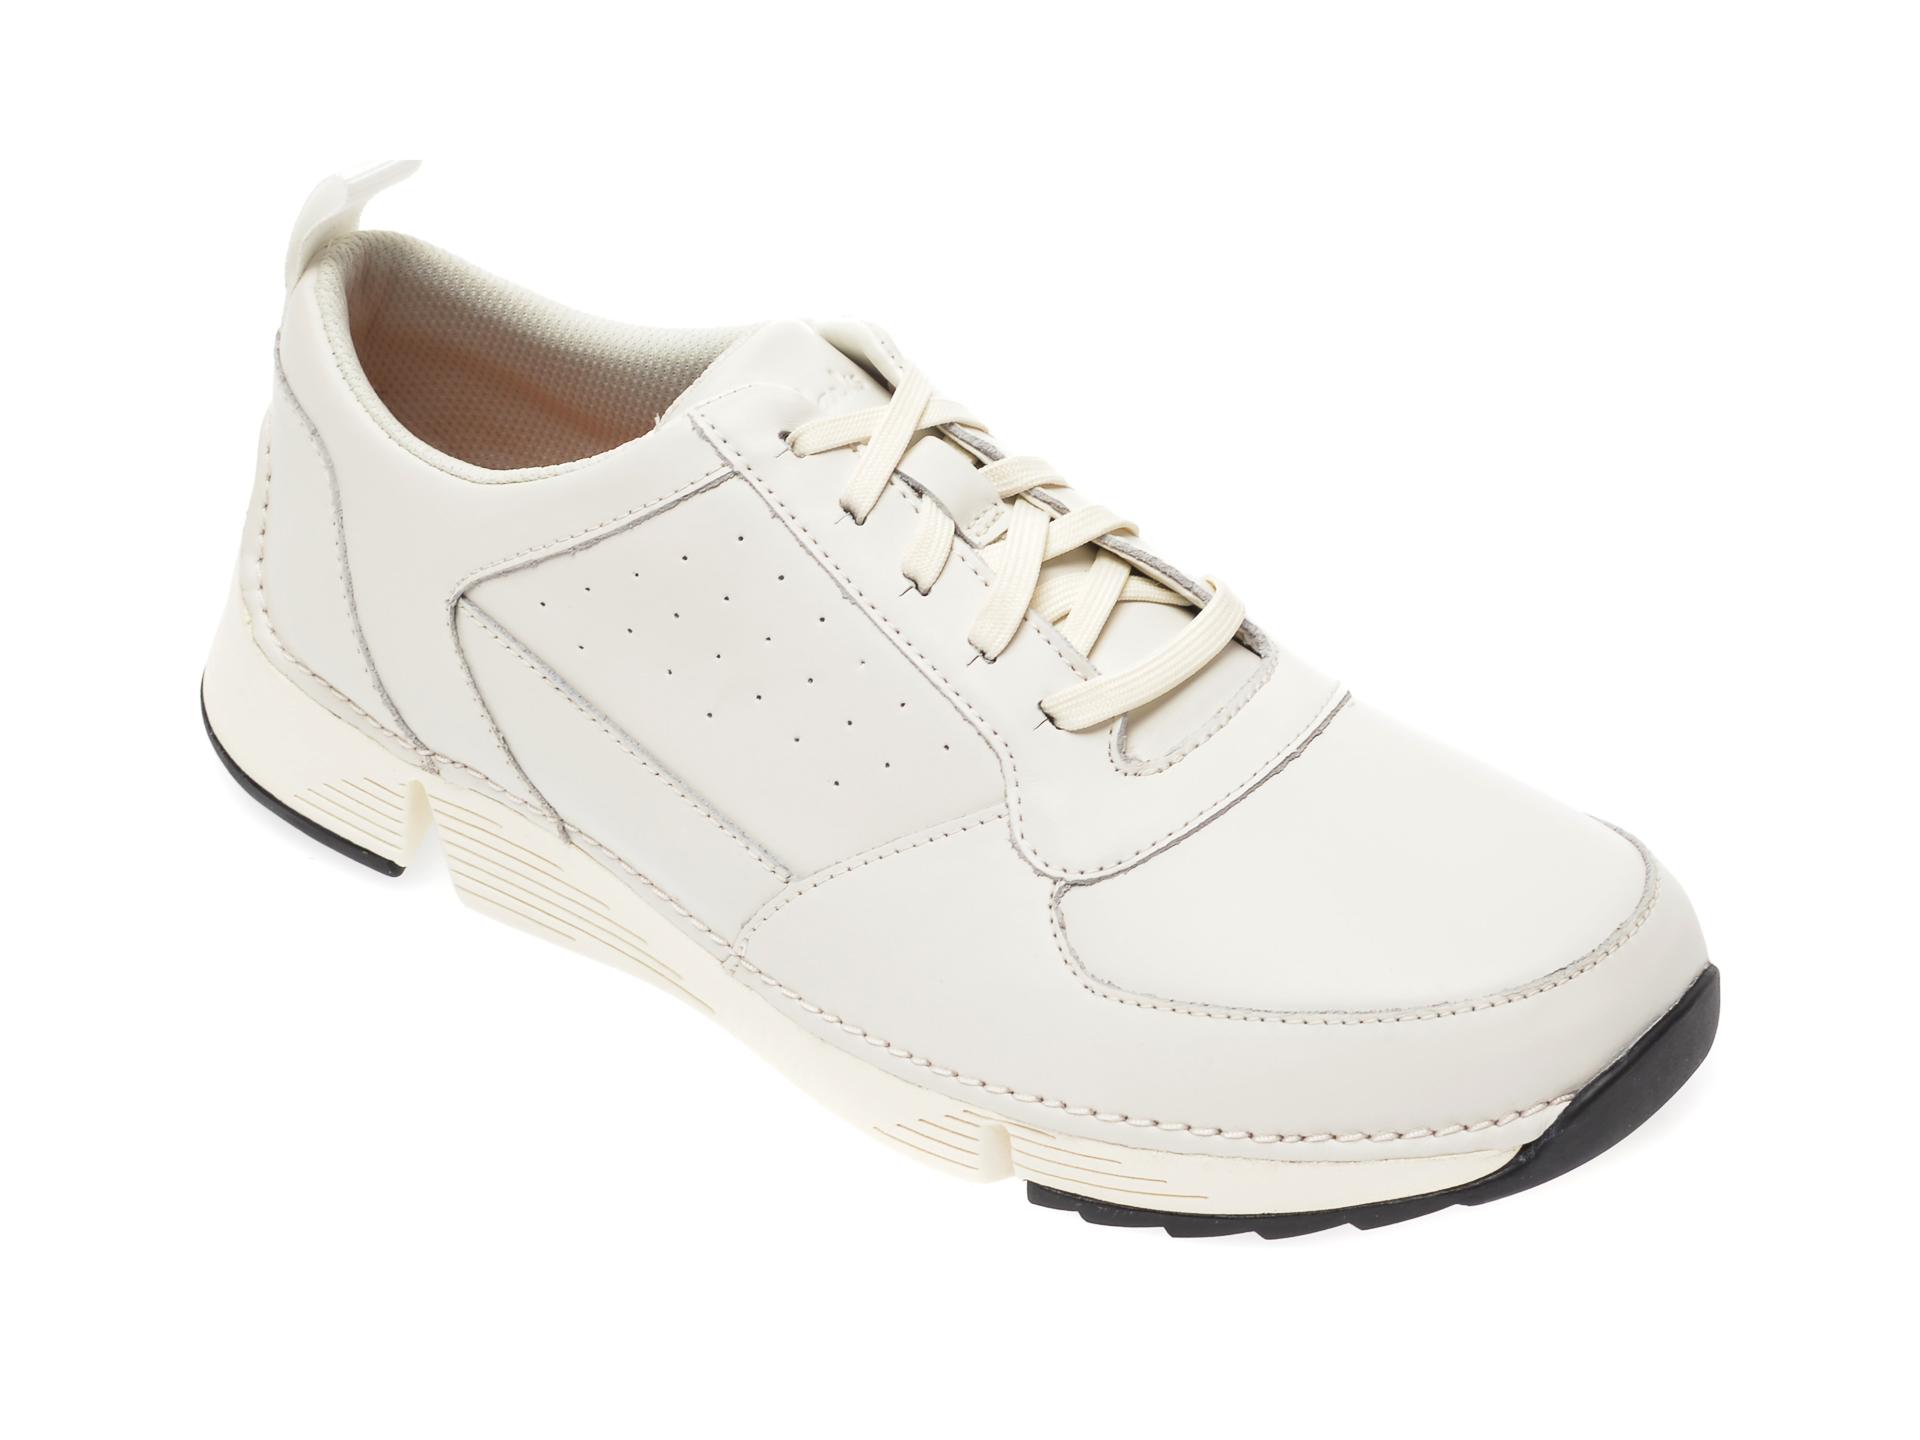 Pantofi CLARKS albi, Tri Sprint, din piele naturala imagine